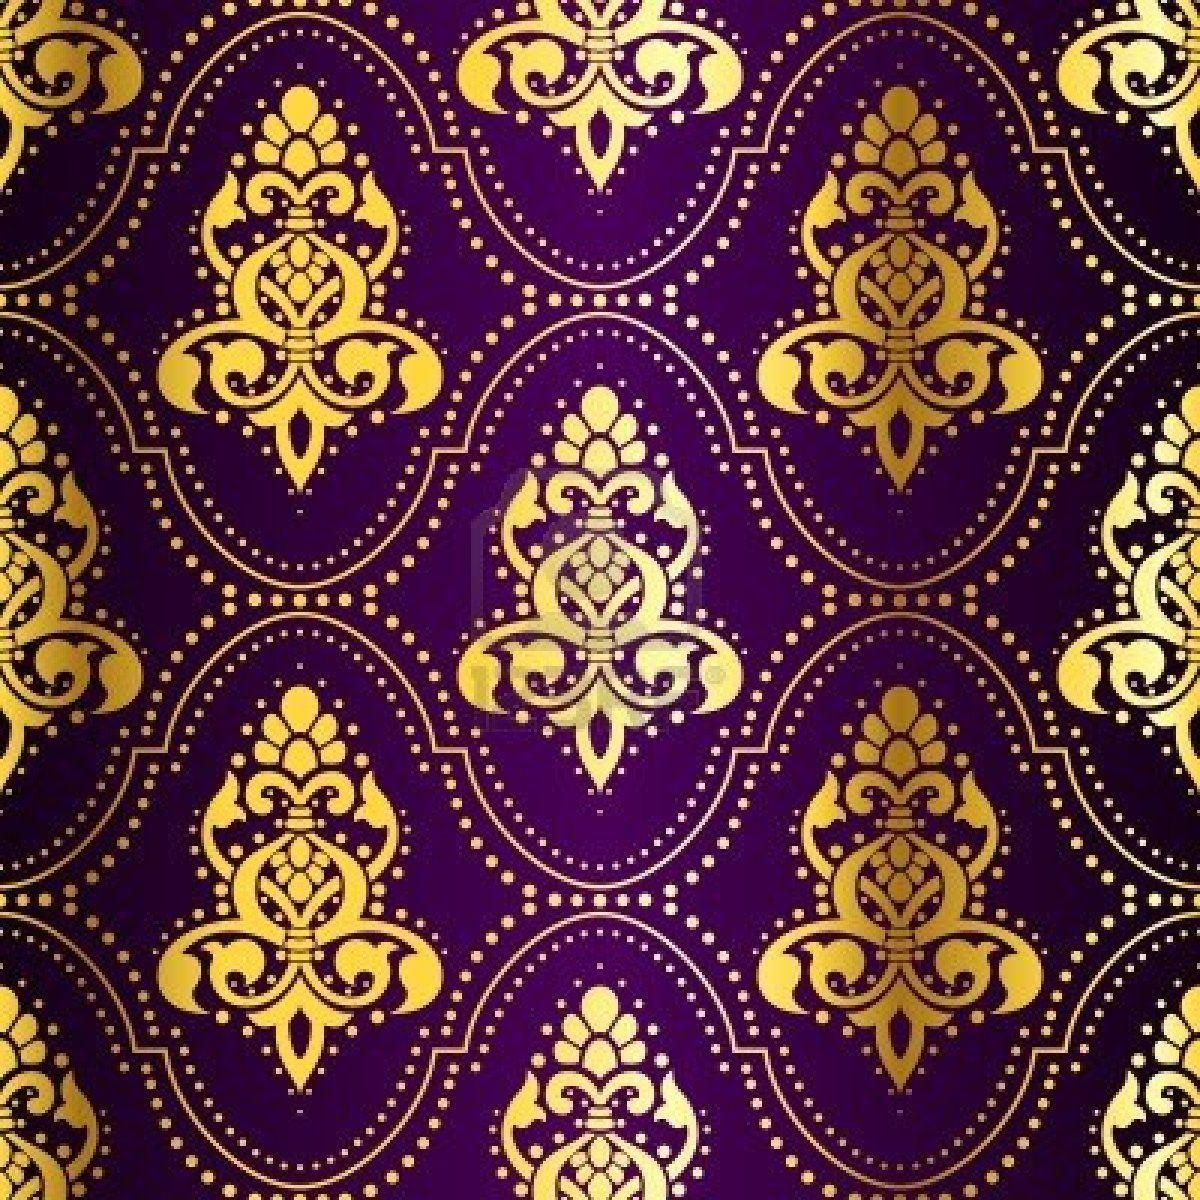 Google Image Result for http://us.123rf.com/400wm/400/400/jadehawk ... for Indian Fabric Designs Patterns  103wja